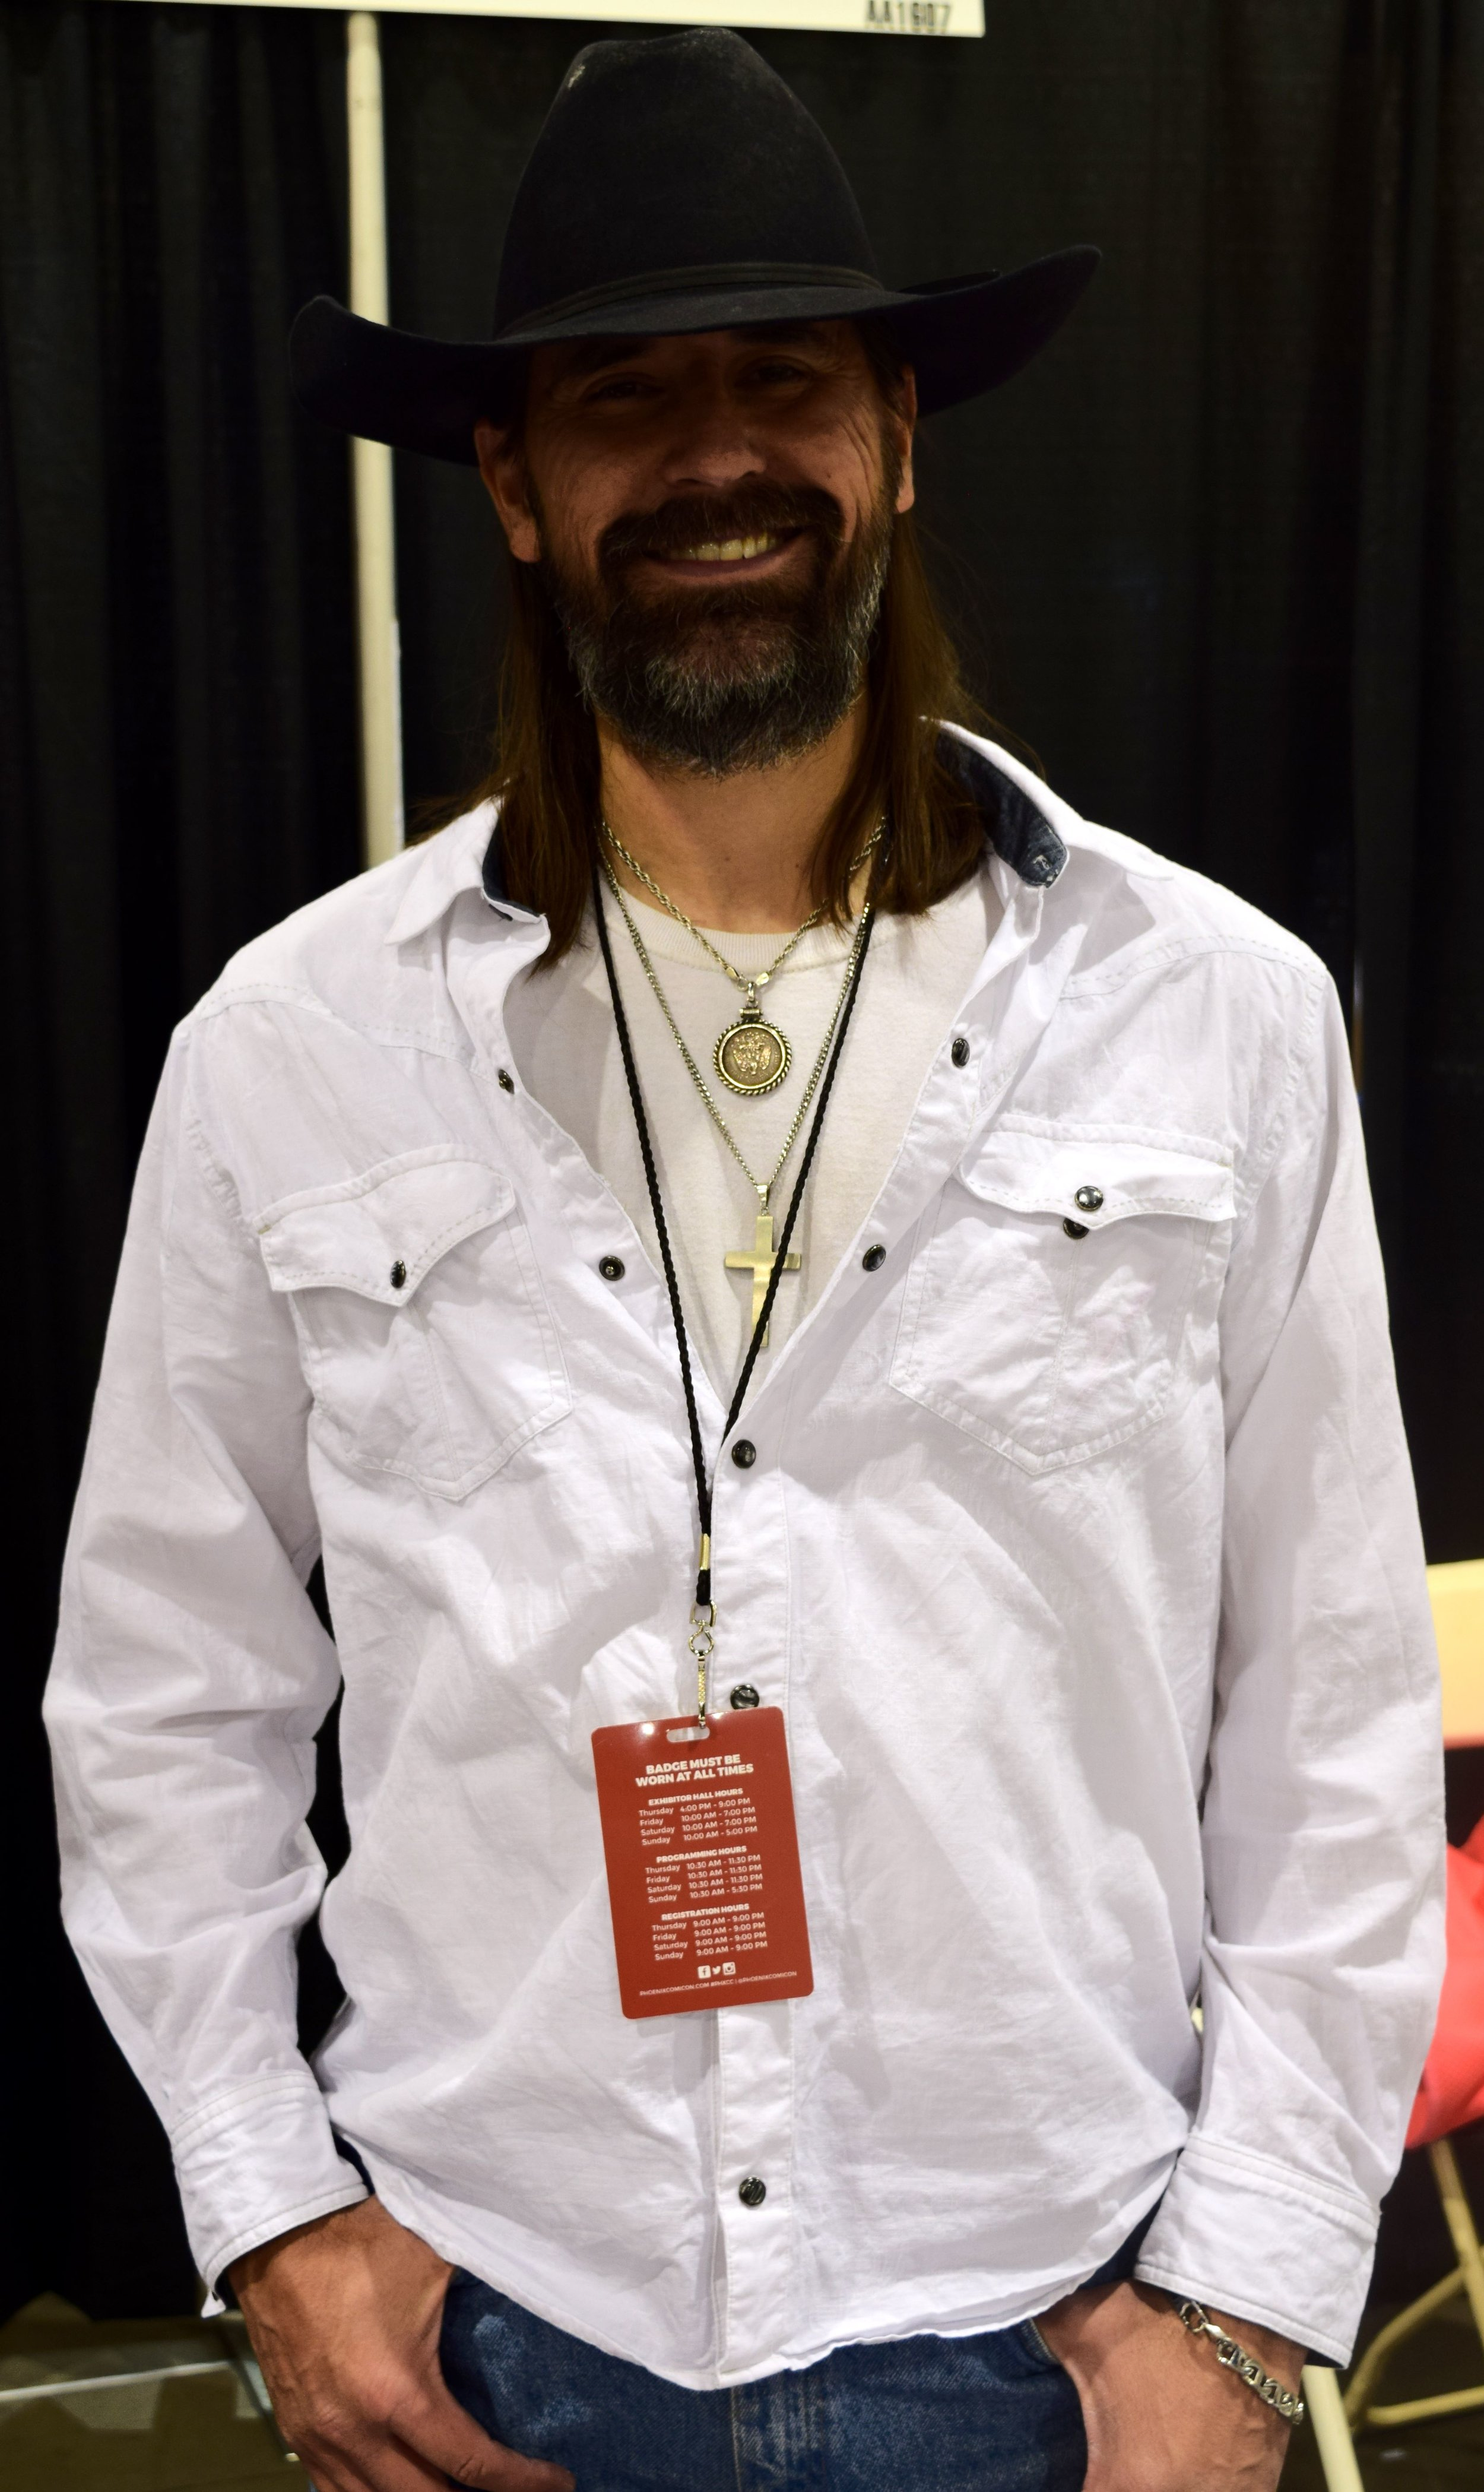 Shawn Fillbach at Phoenix Comic Con 2017.